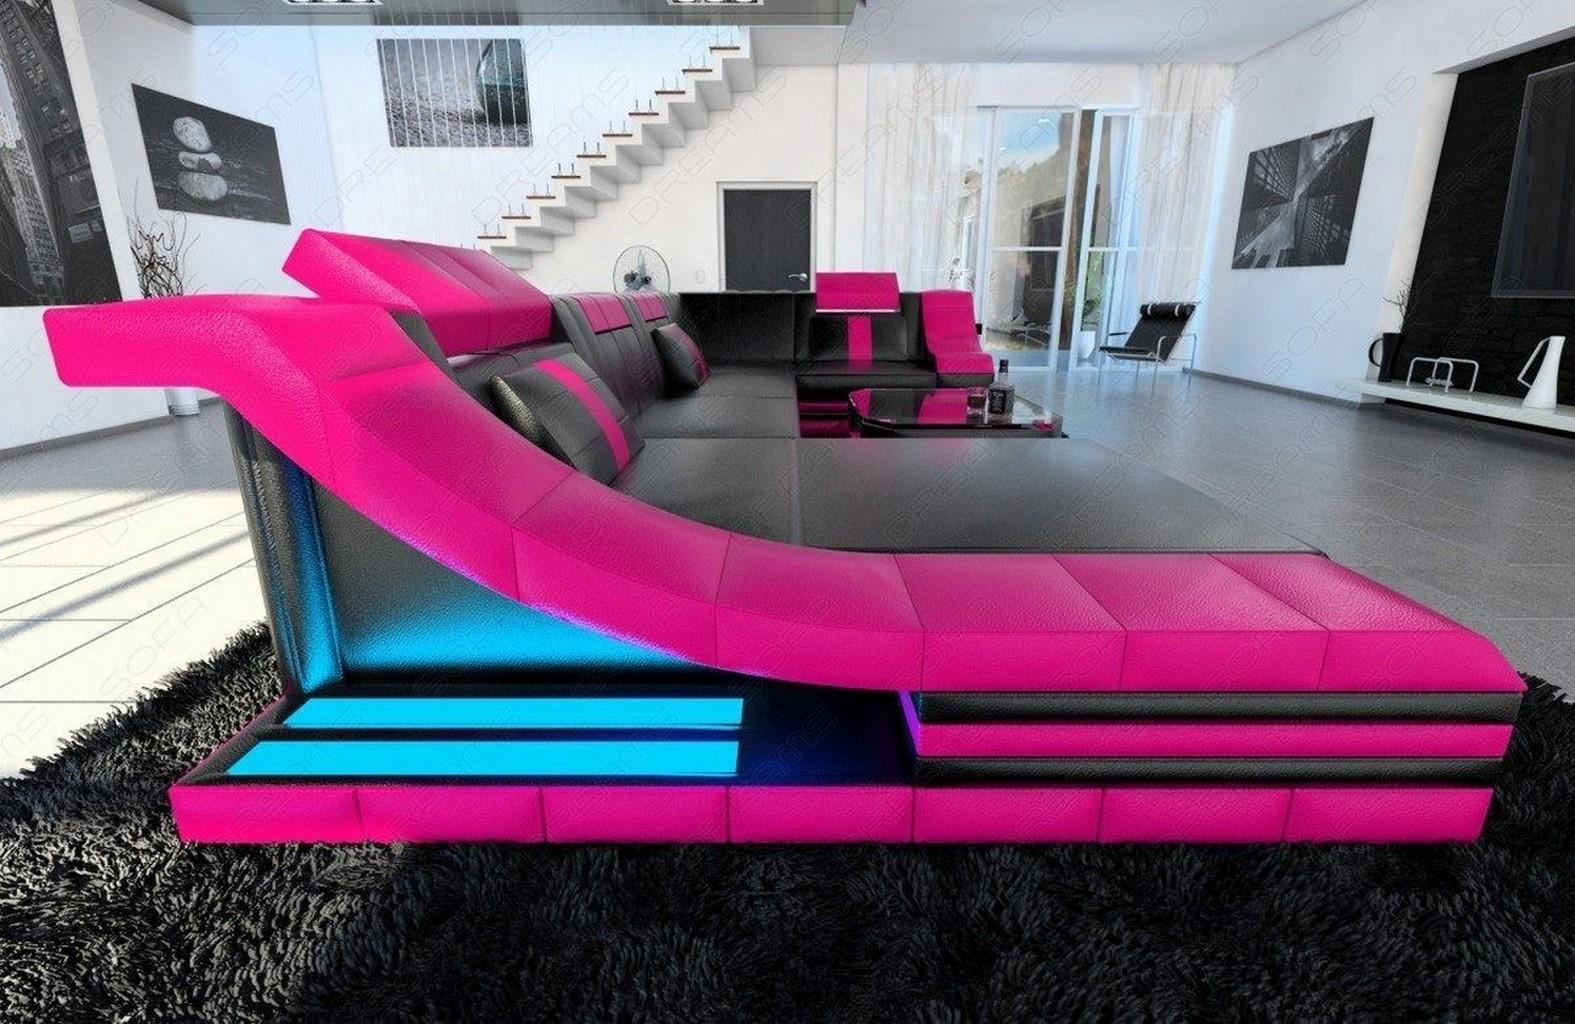 Eckcouch turino u form mit led beleuchtung schwarz pink for Eckcouch mit led